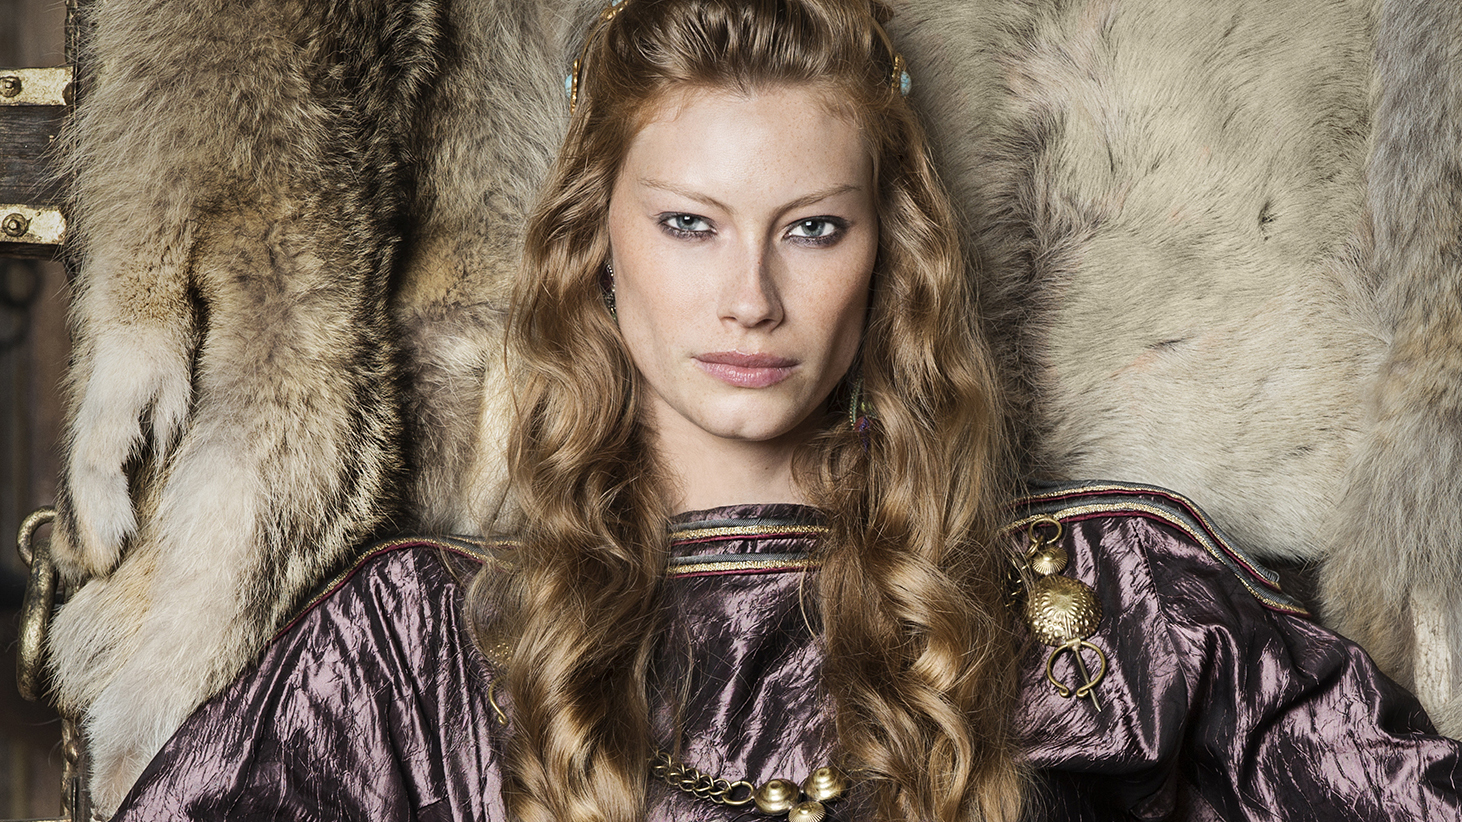 Aslaug Vikings